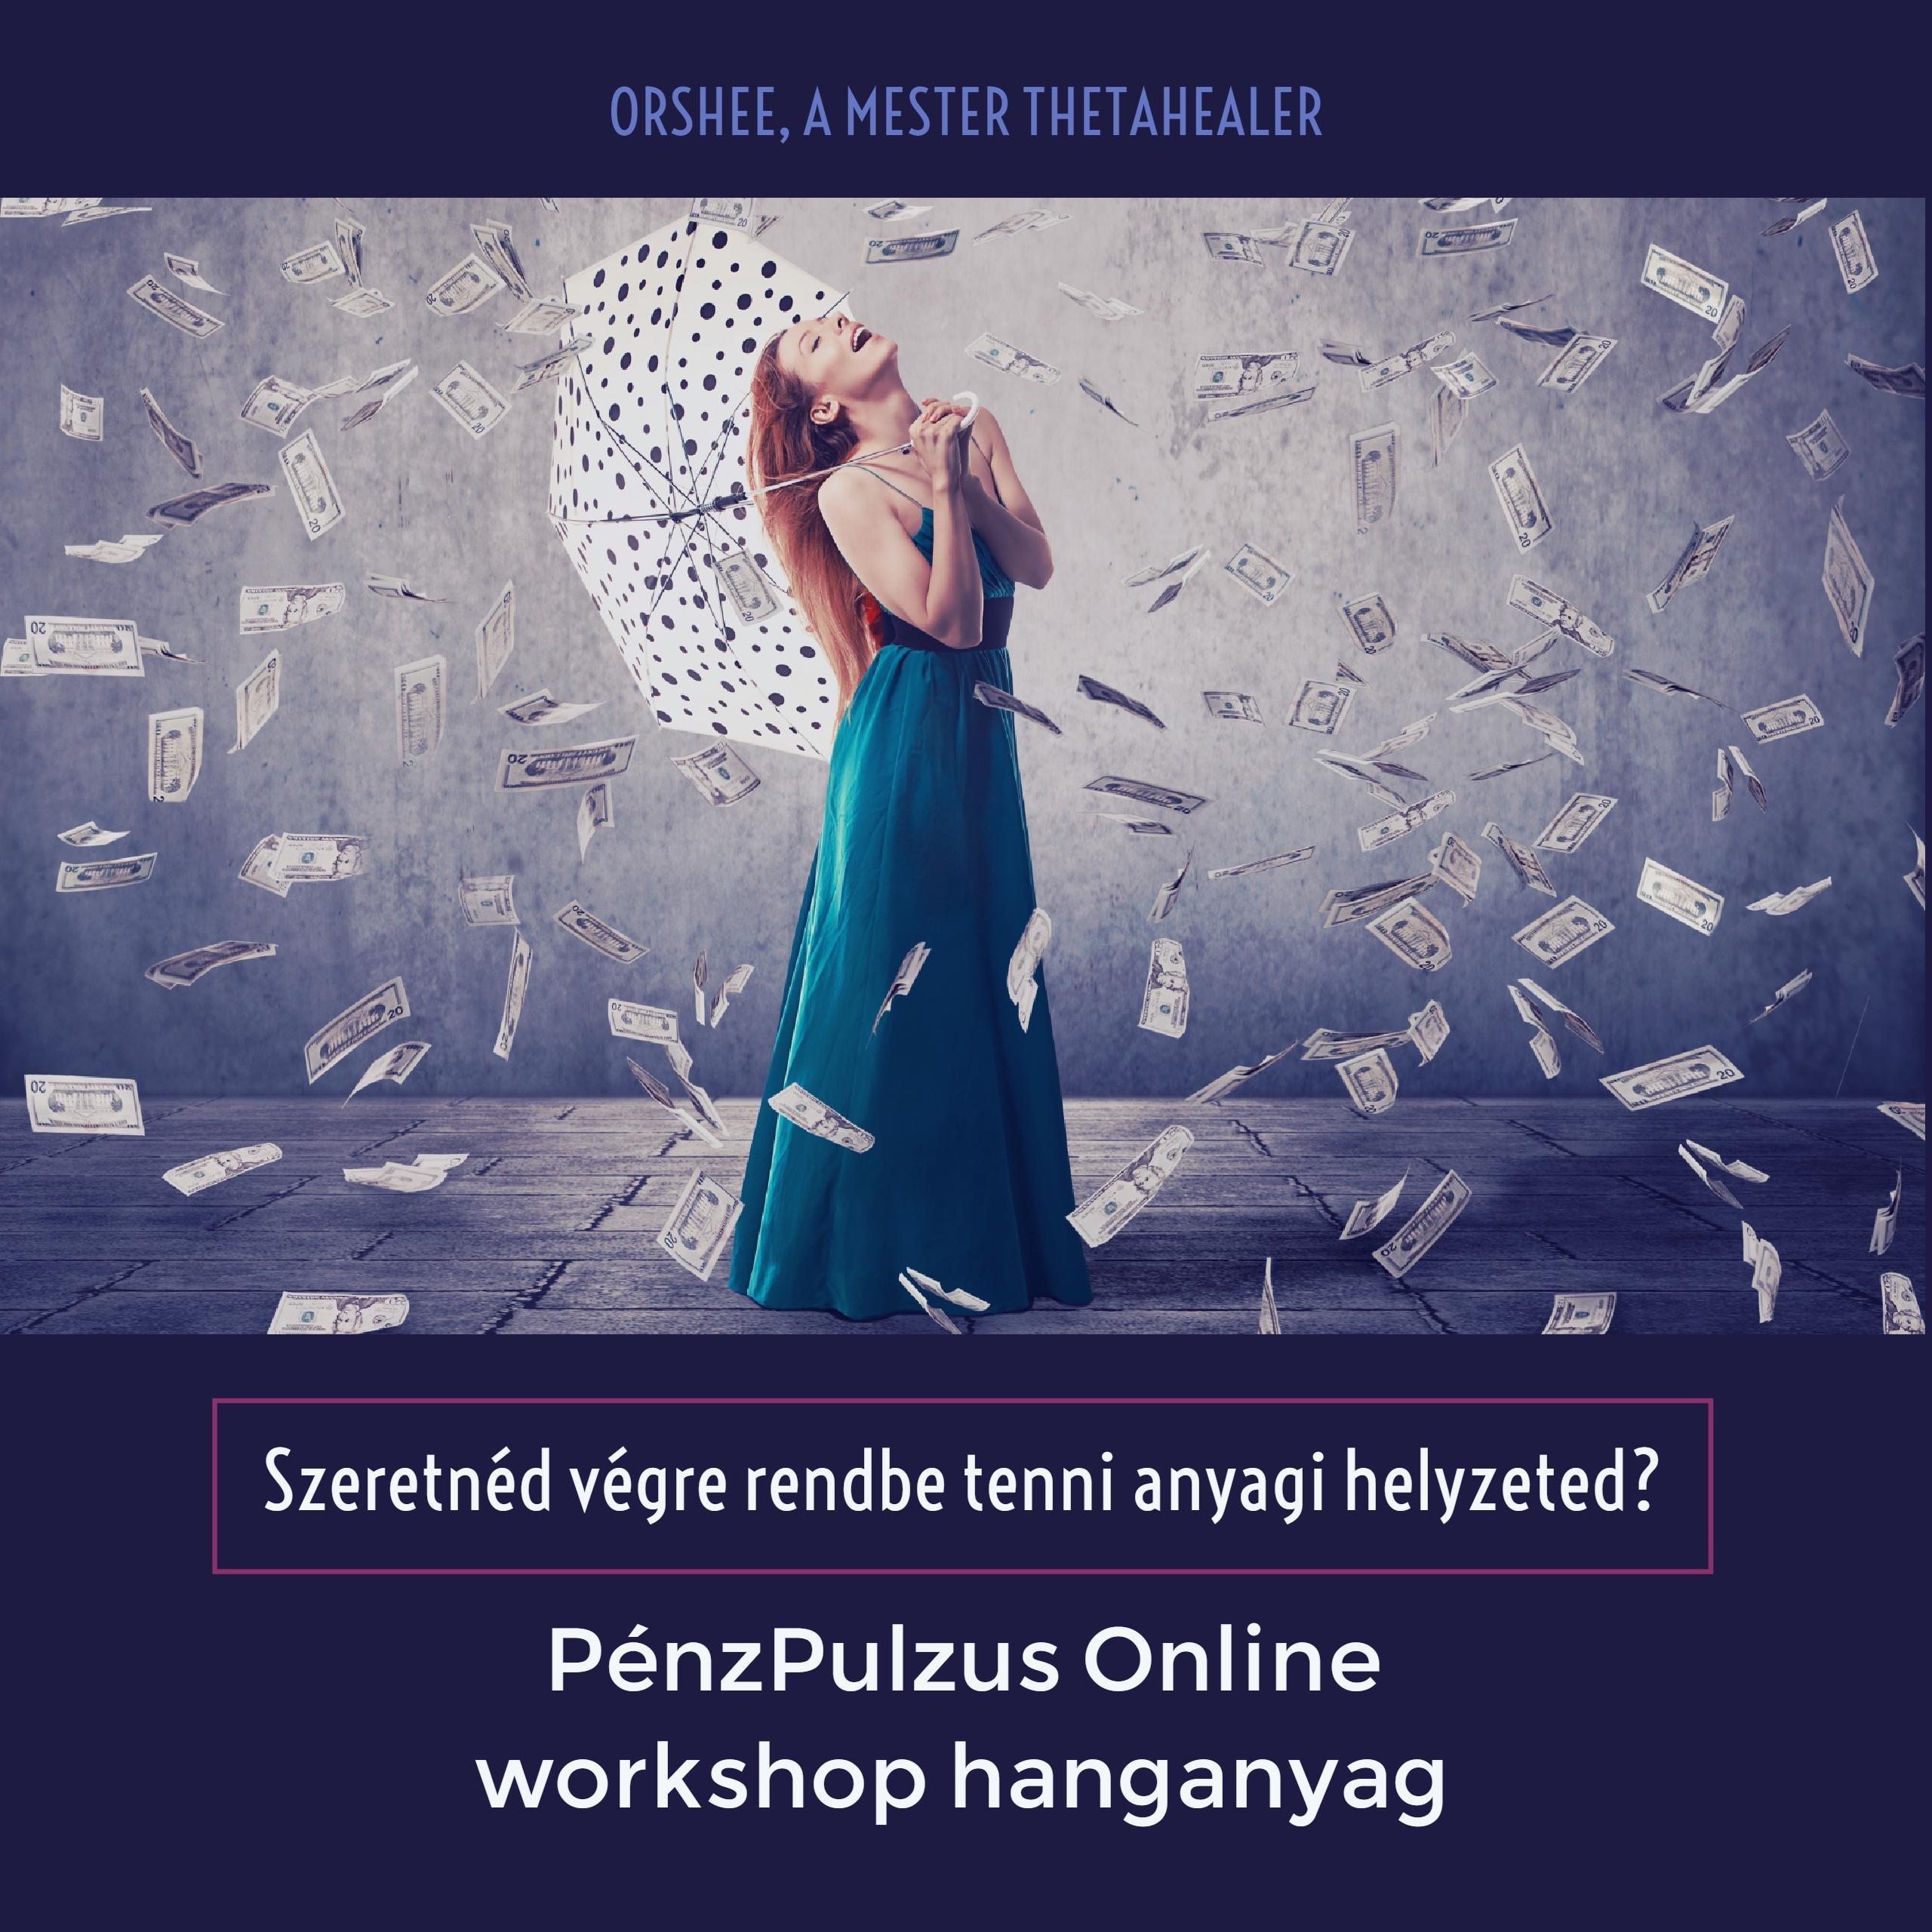 PénzPulzus online workshop hanganyag Orshee-val 161208